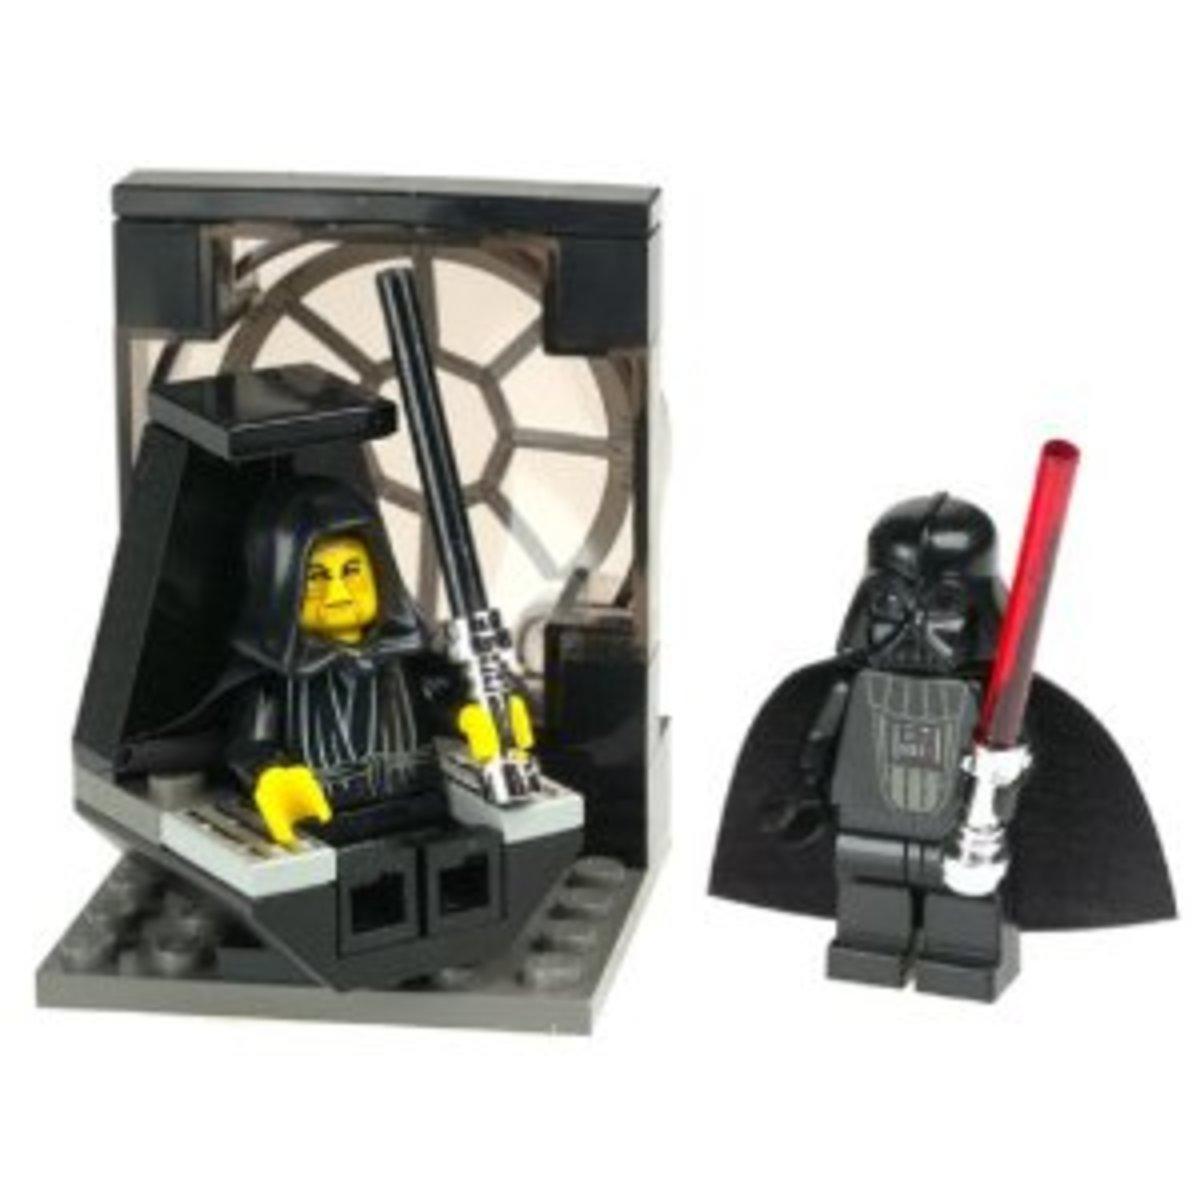 LEGO Star Wars Final Duel 1 7200 Assembled